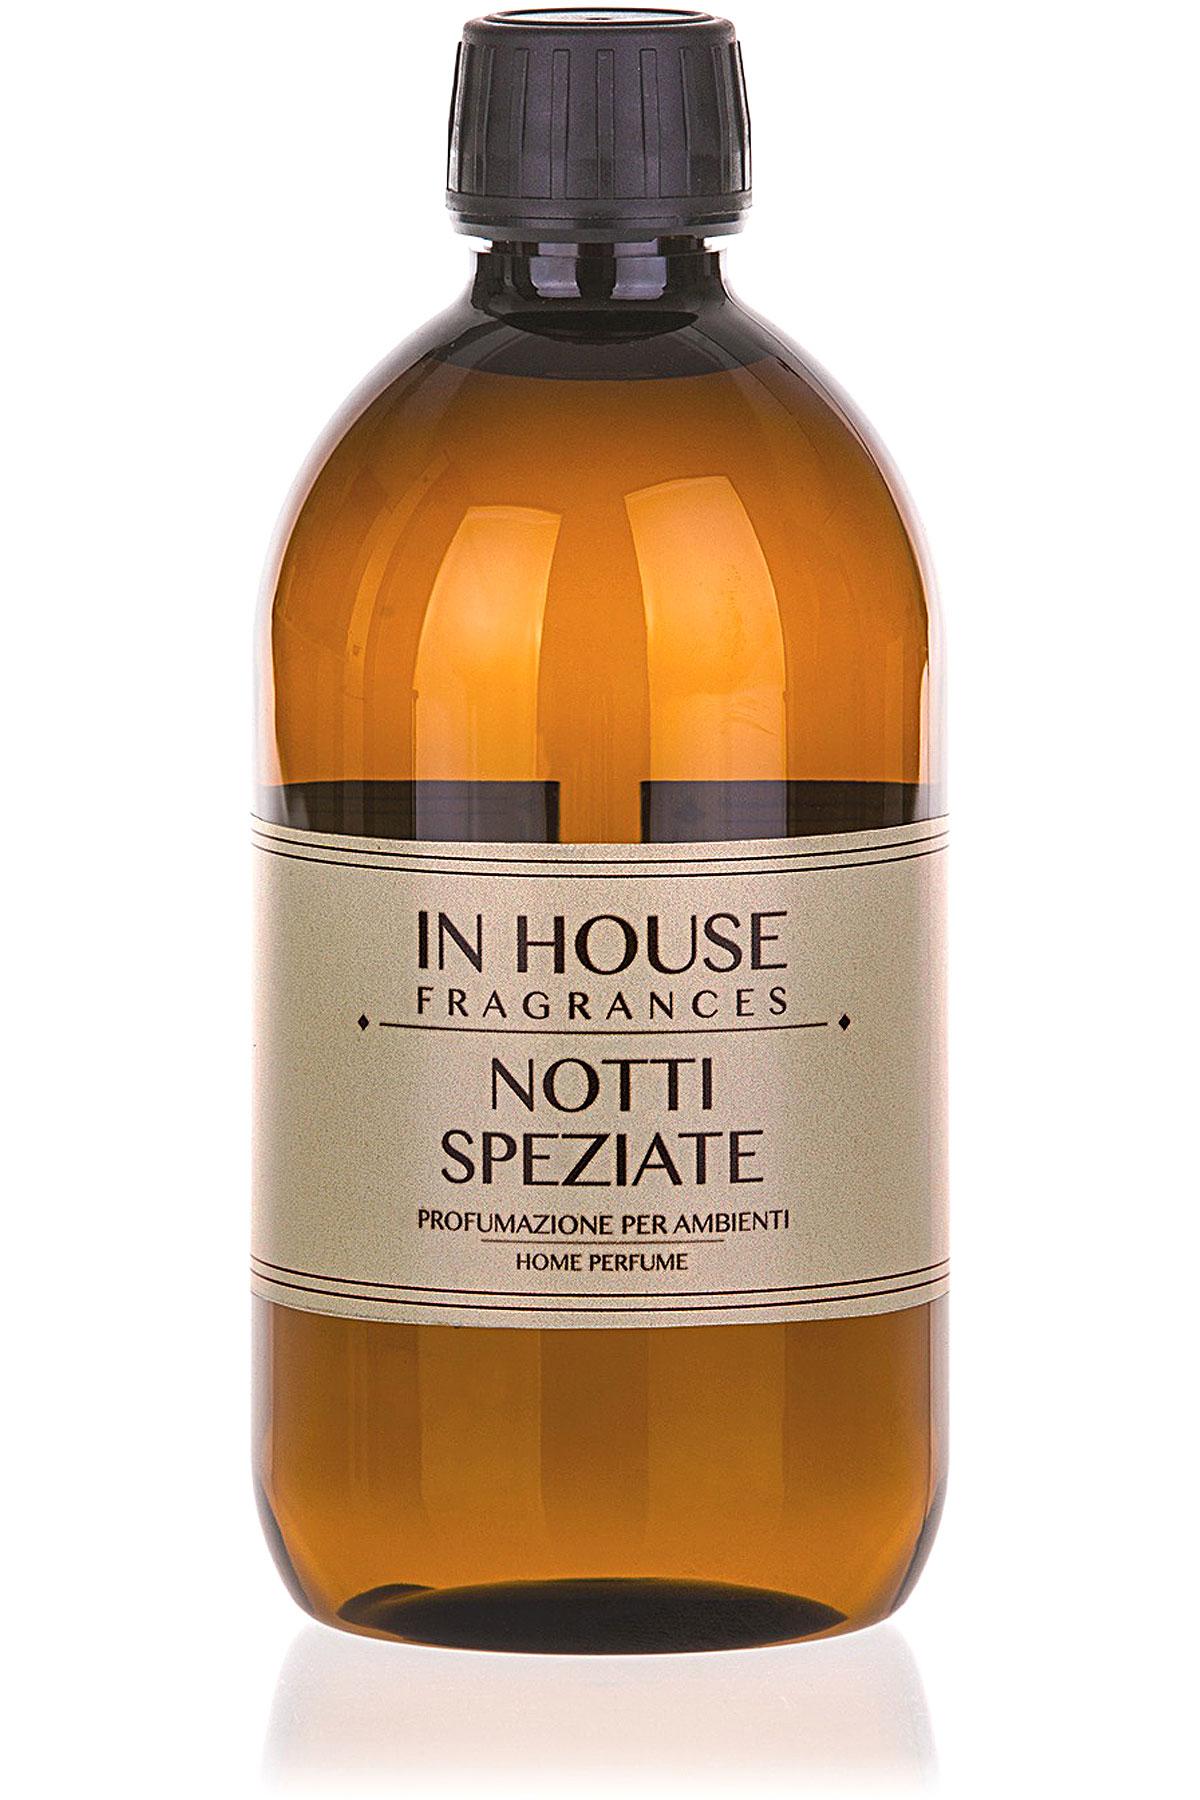 In House Fragrances Home Scents for Men, Notti Speziate - Refill - 500 Ml, 2019, 500 ml